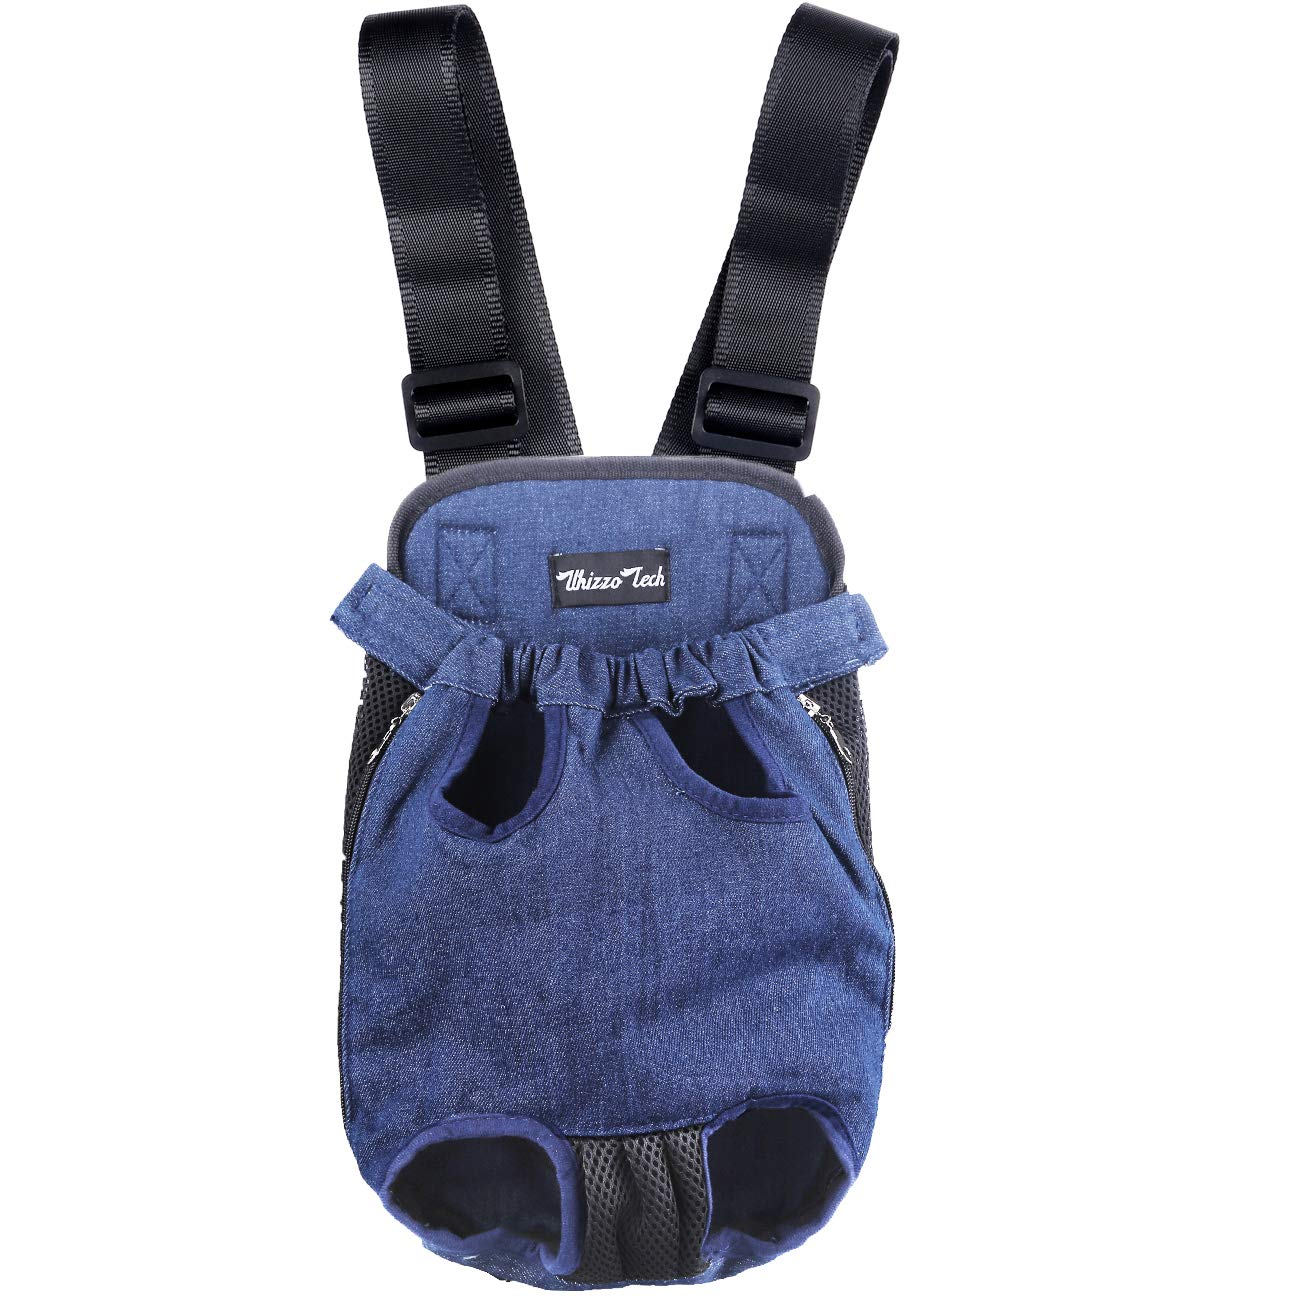 Whizzotech Pet Carrier Backpack, Adjustable Pet Front Cat Dog Carrier Backpack Travel Bag, Legs Out, Easy-Fit for Traveling Hiking Camping PB03 (L, Denim)